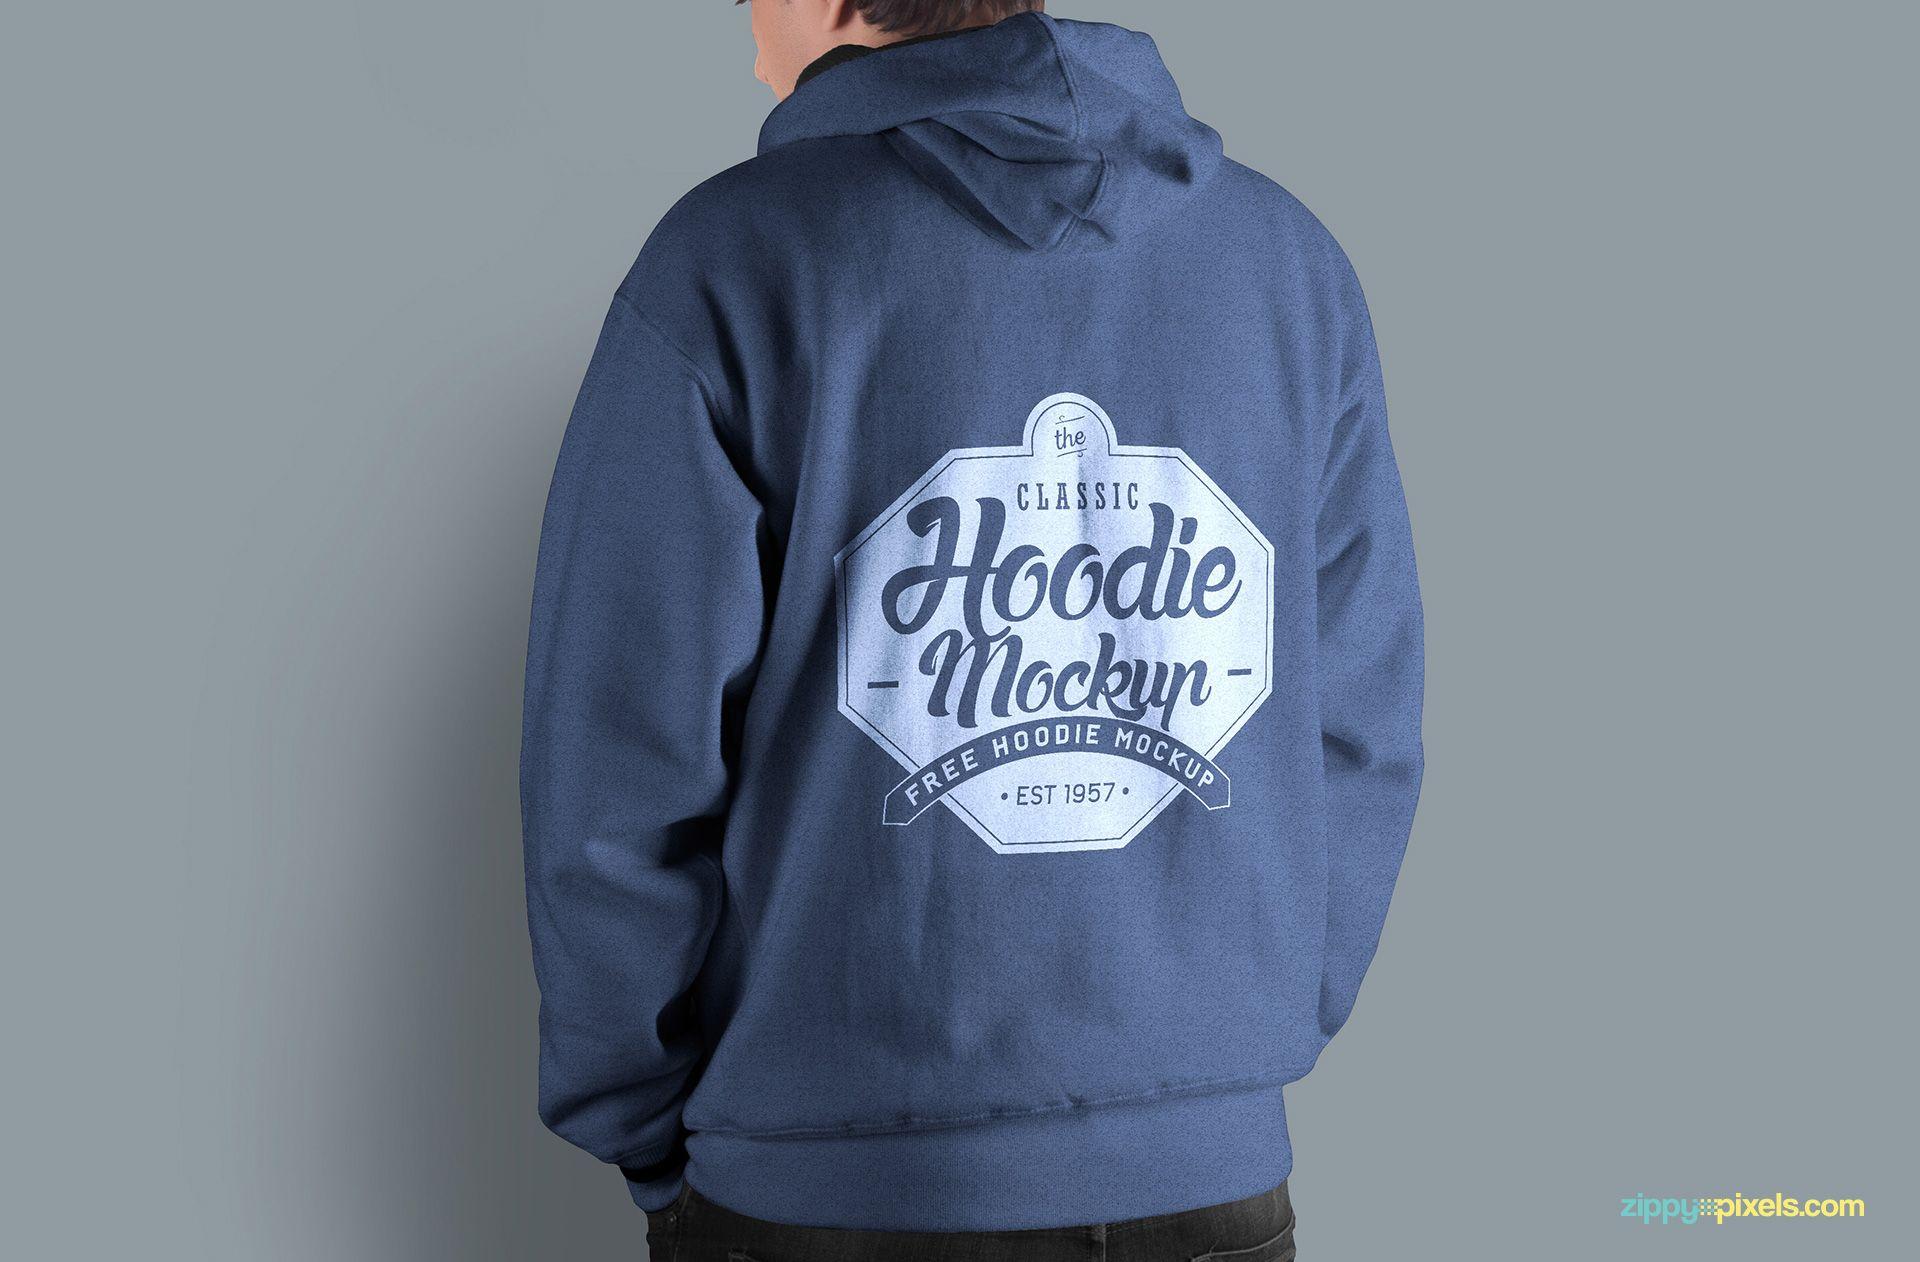 Download Hoodie Mockup Free Psd Download Zippypixels Hoodie Mockup Free Hoodie Mockup Hoodies